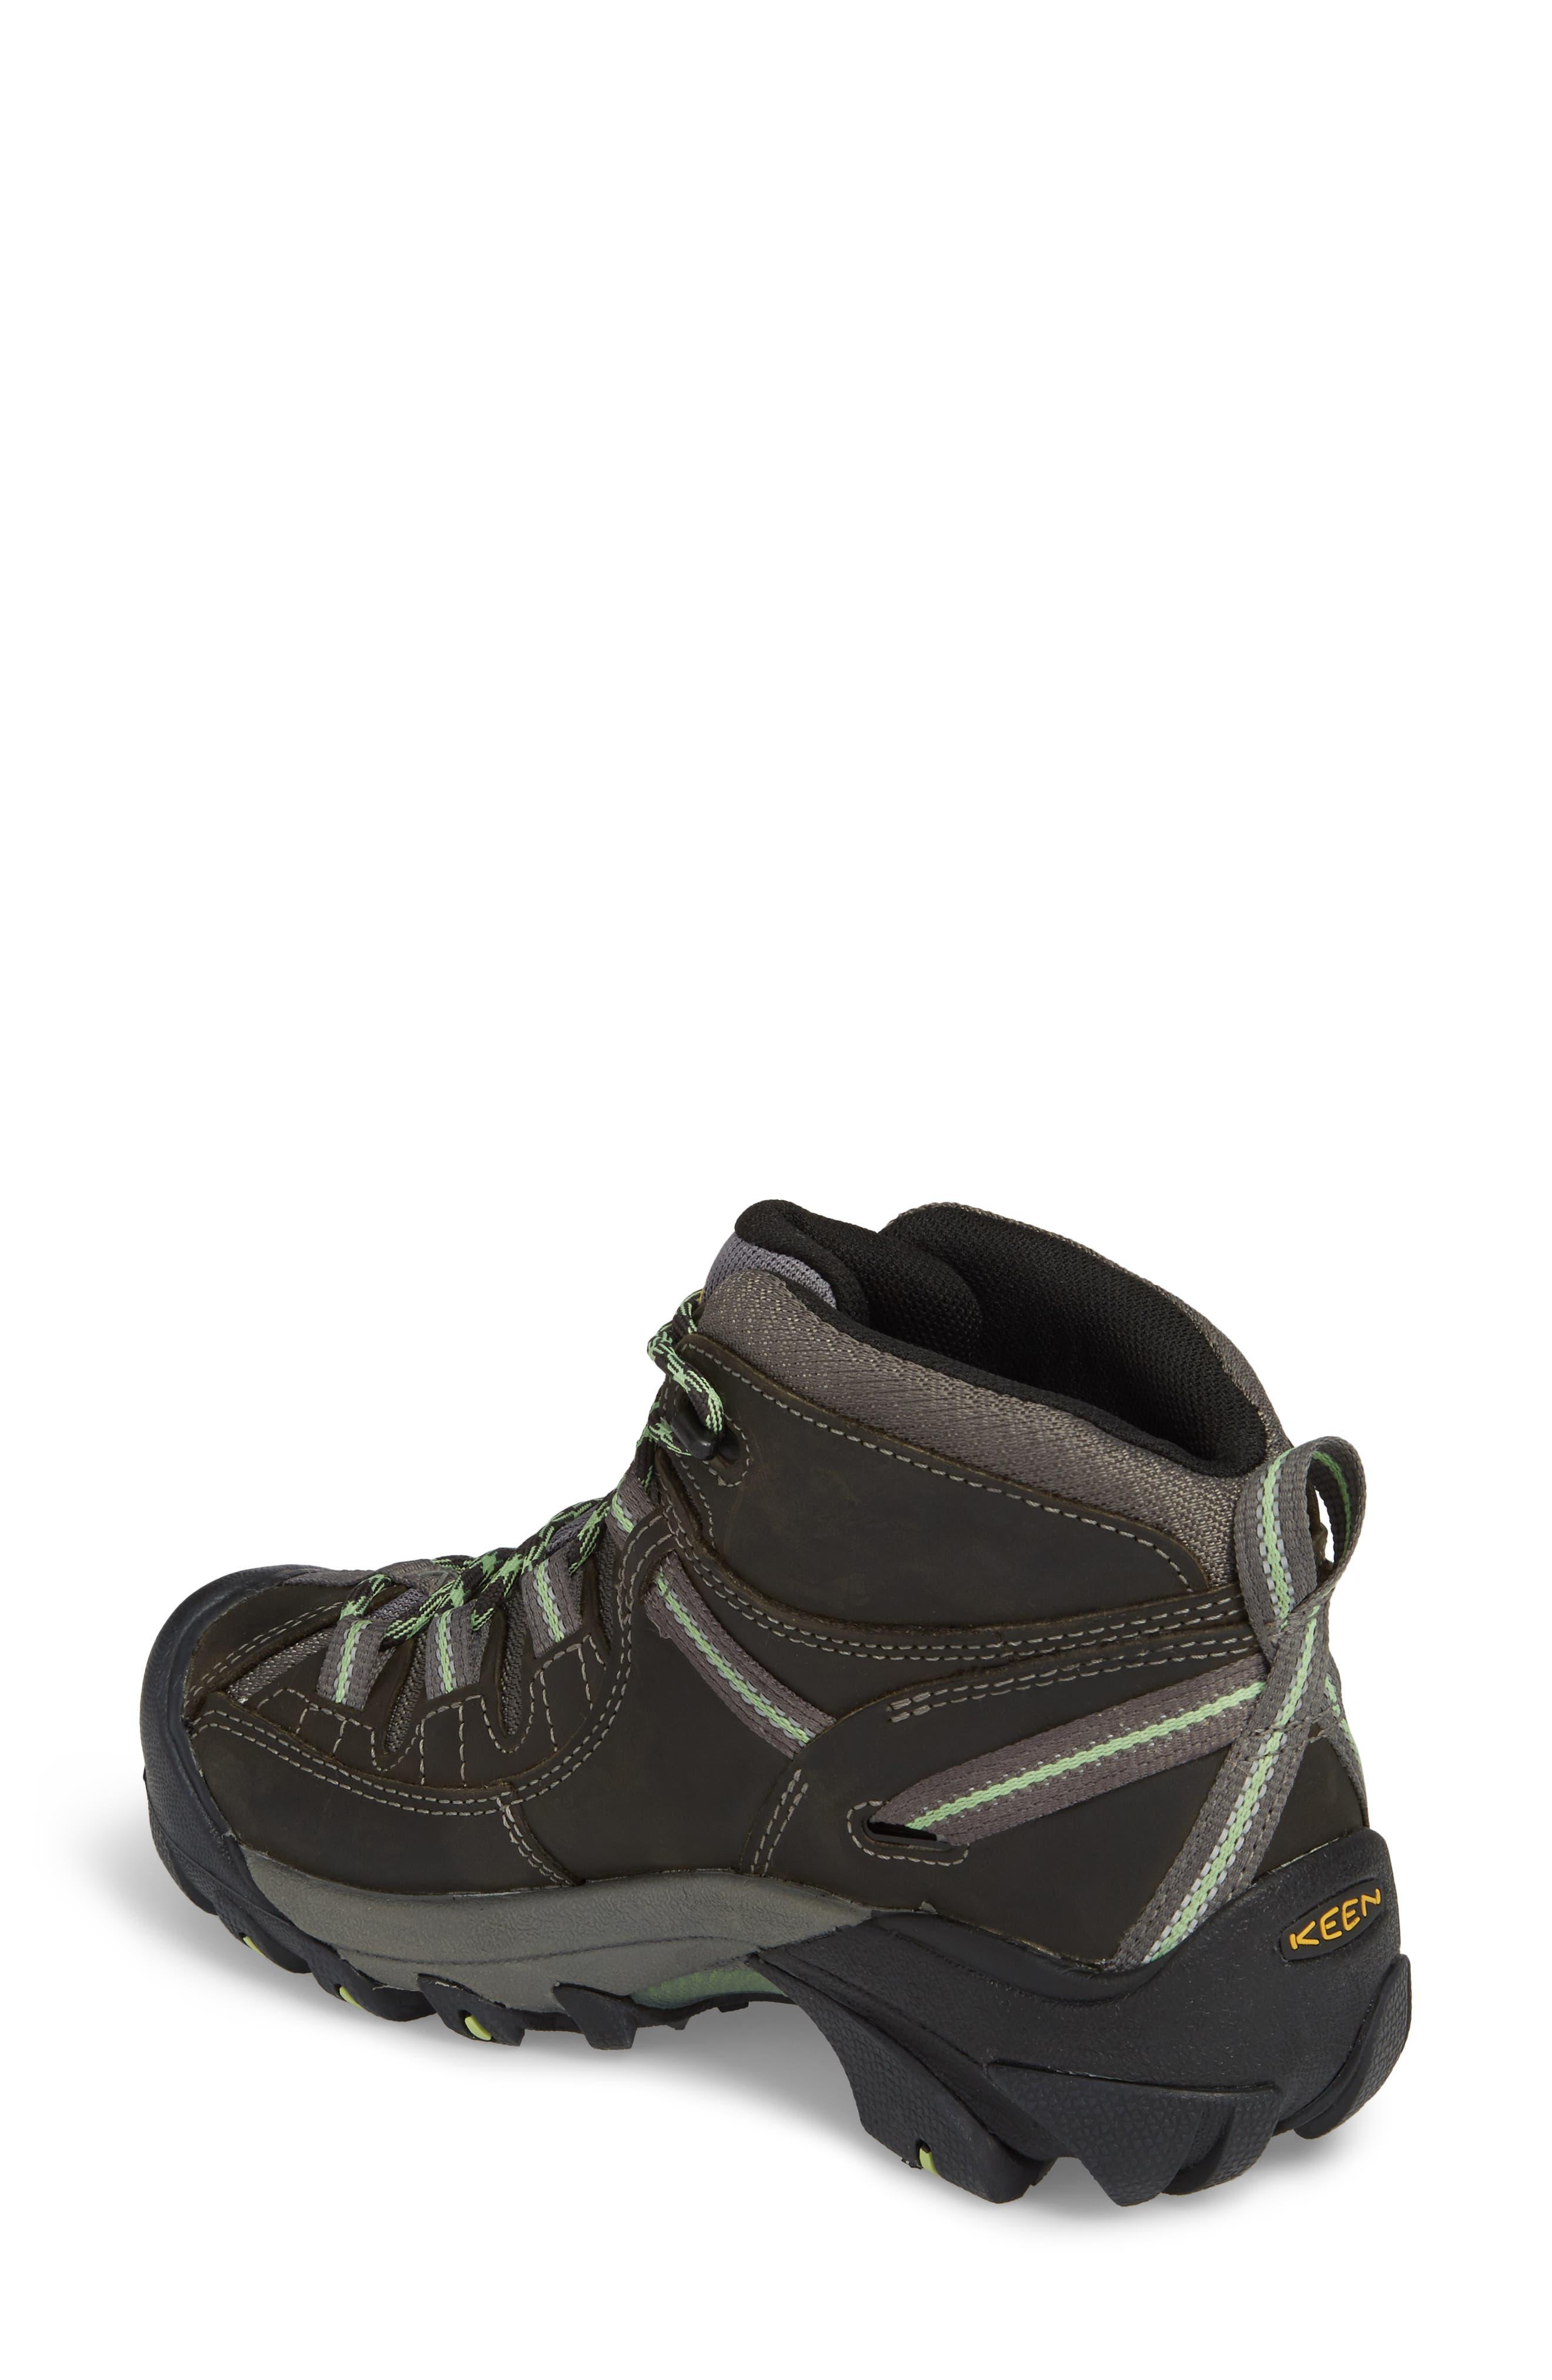 KEEN, Targhee II Mid Waterproof Hiking Boot, Alternate thumbnail 2, color, RAVEN/ OPALINE